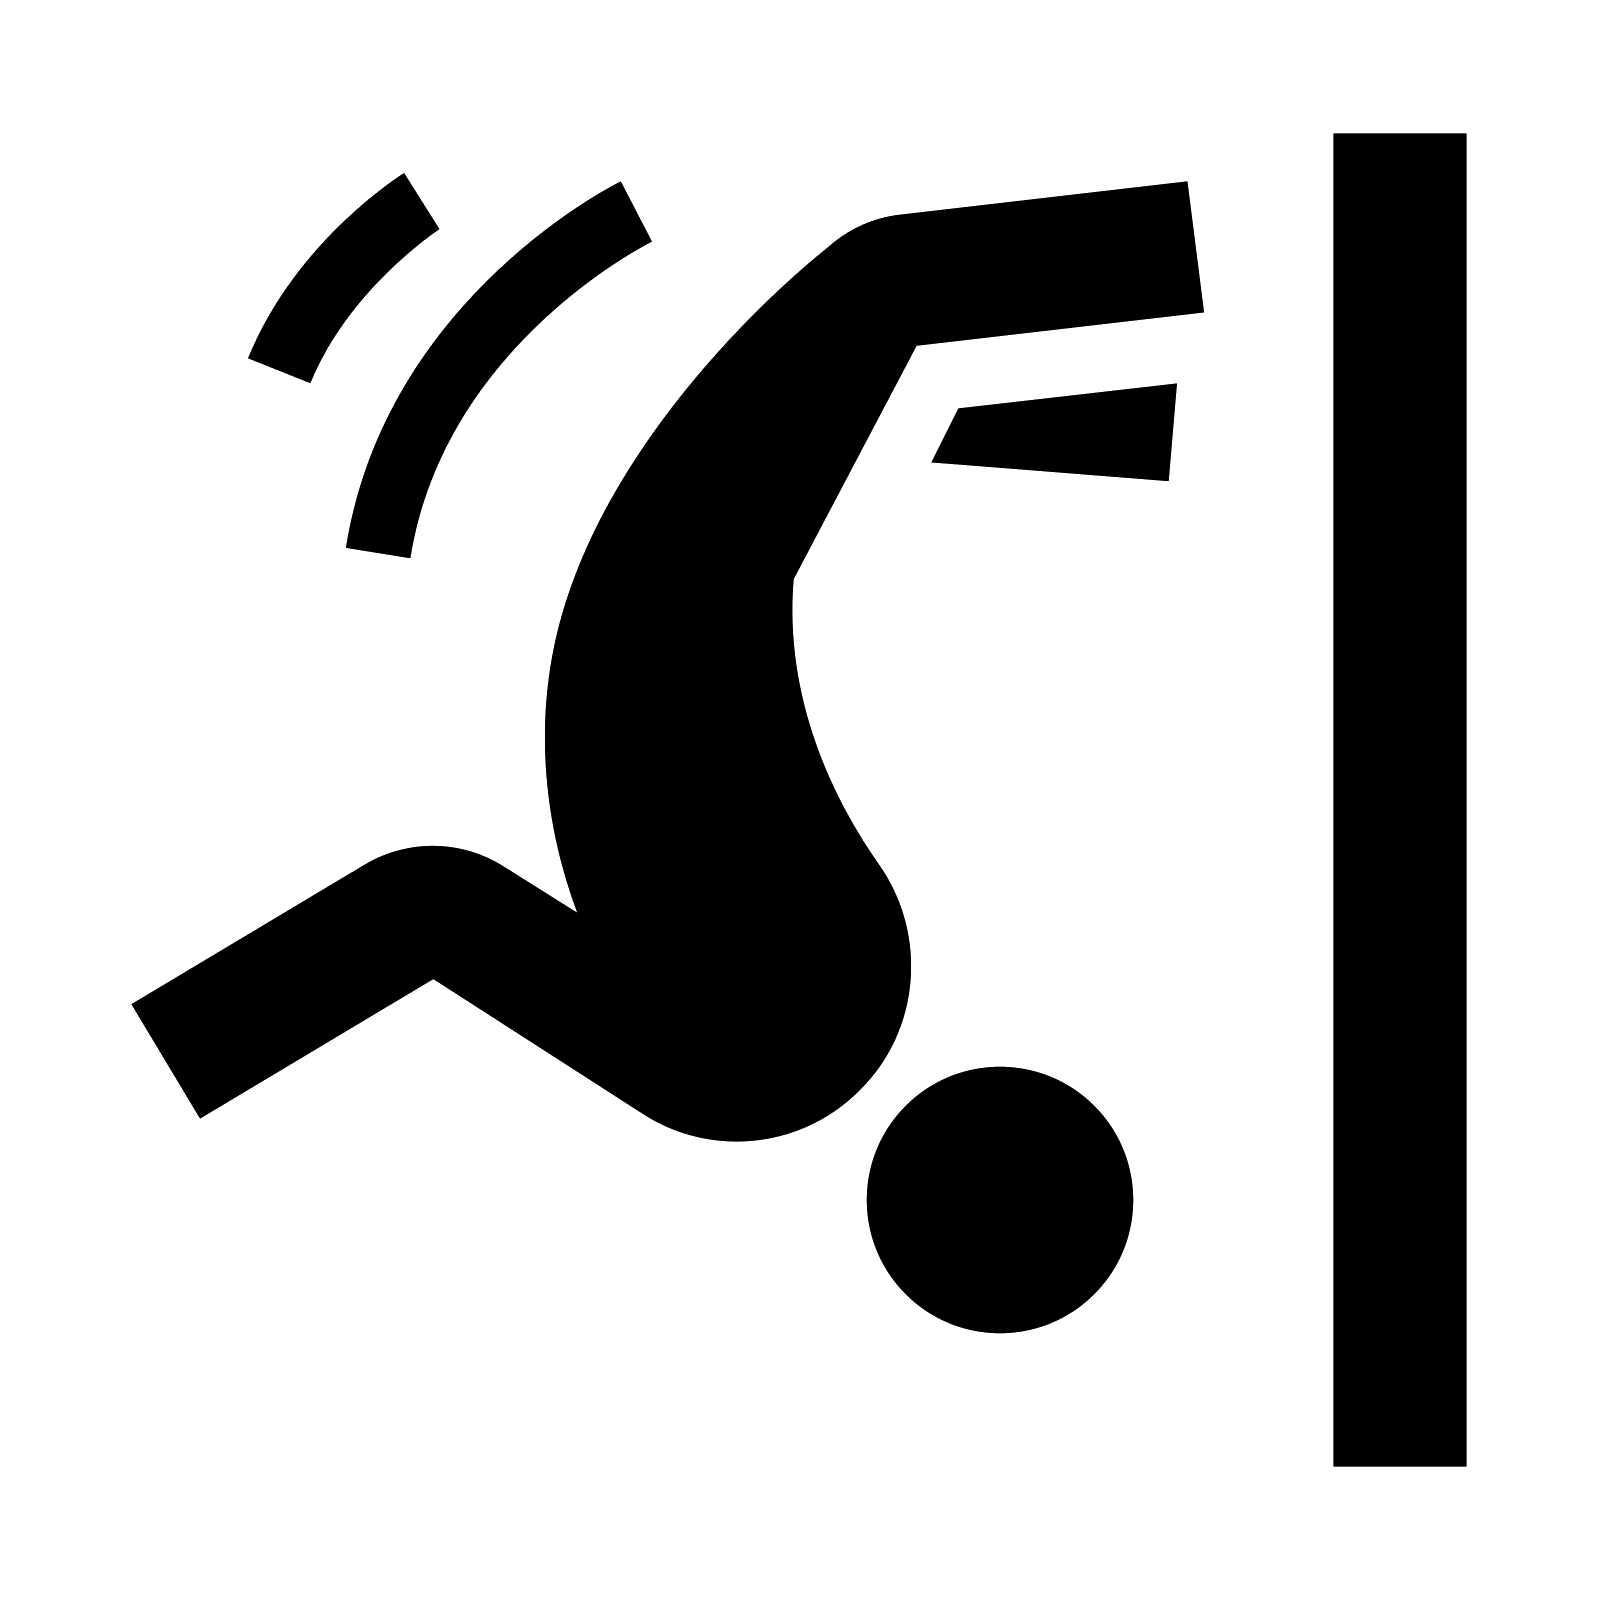 Gymnast silhouette